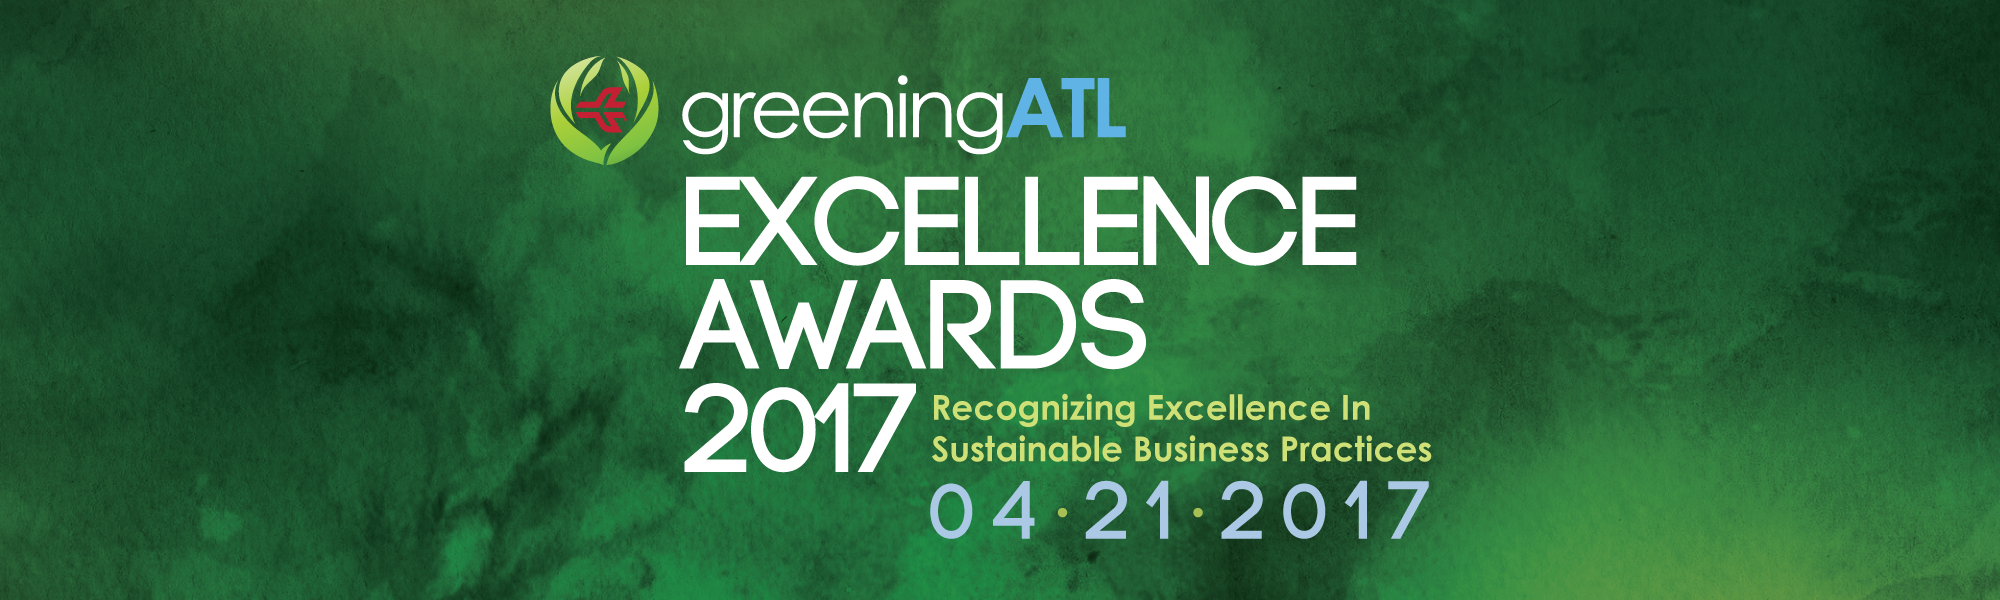 GreeningATL Excellence Awards April 21, 2017